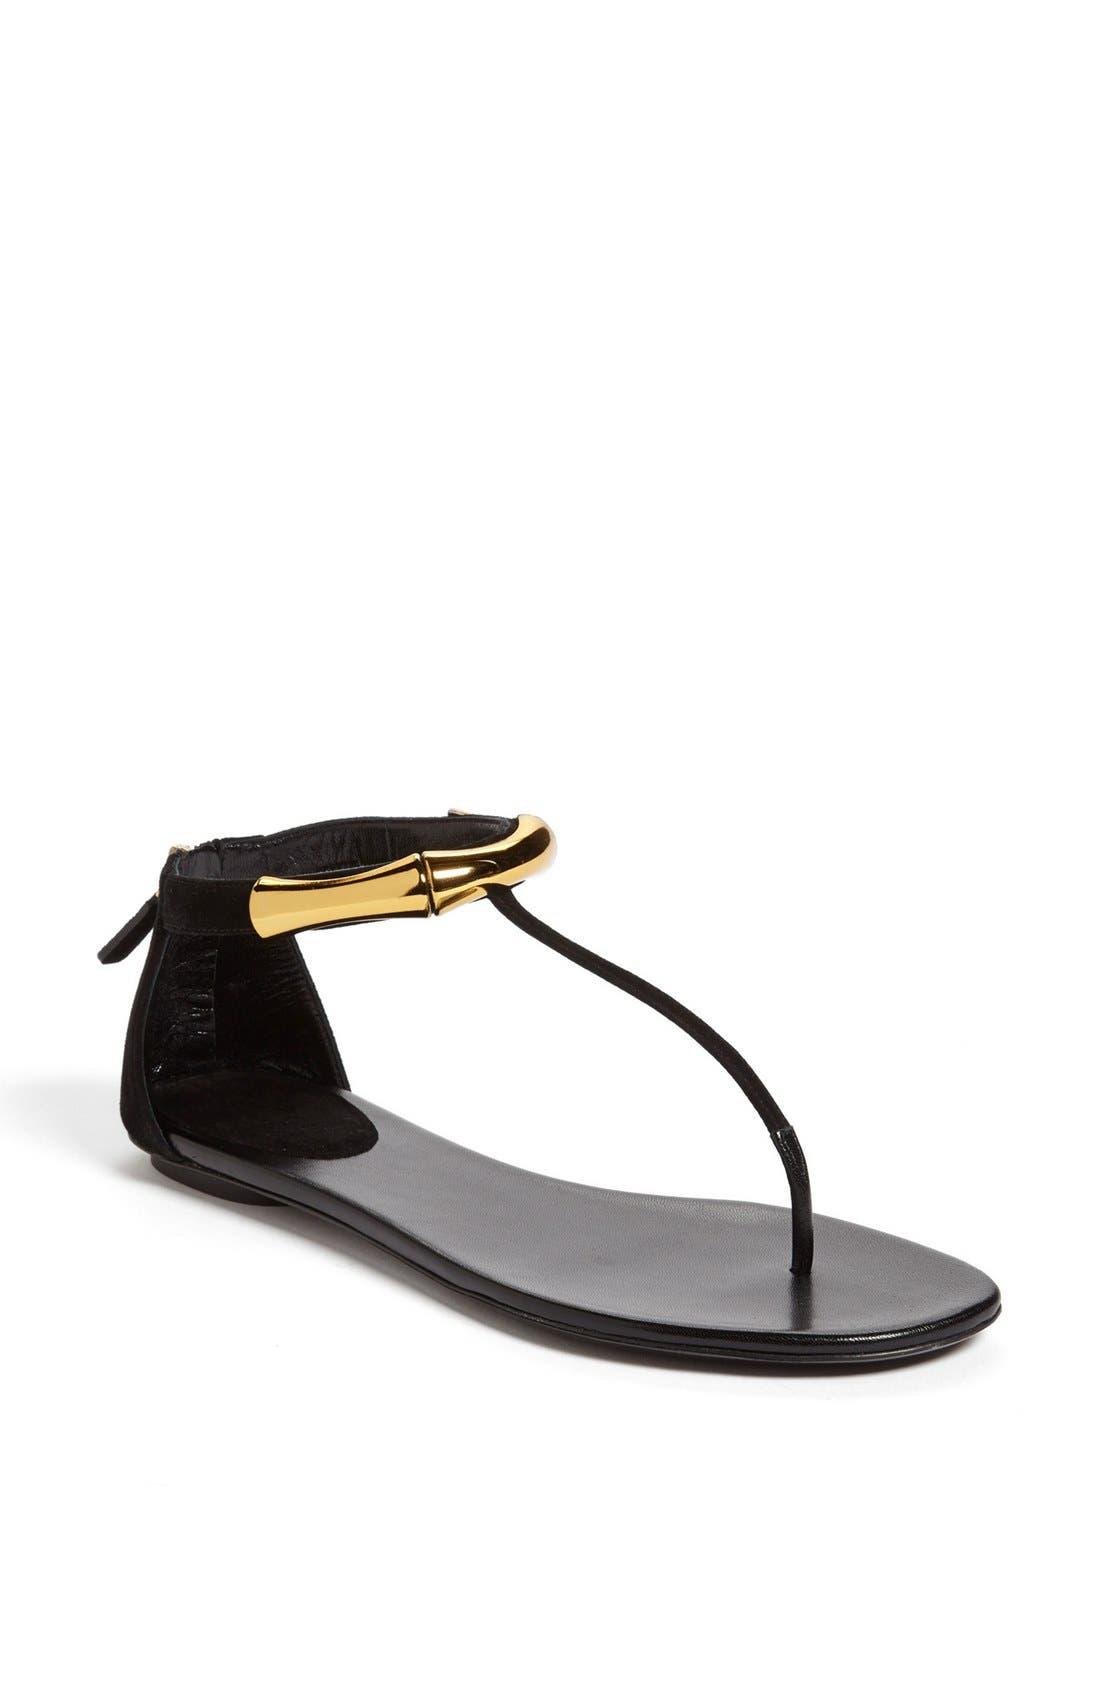 Main Image - Gucci 'Coraline' Metal T-Strap Sandal